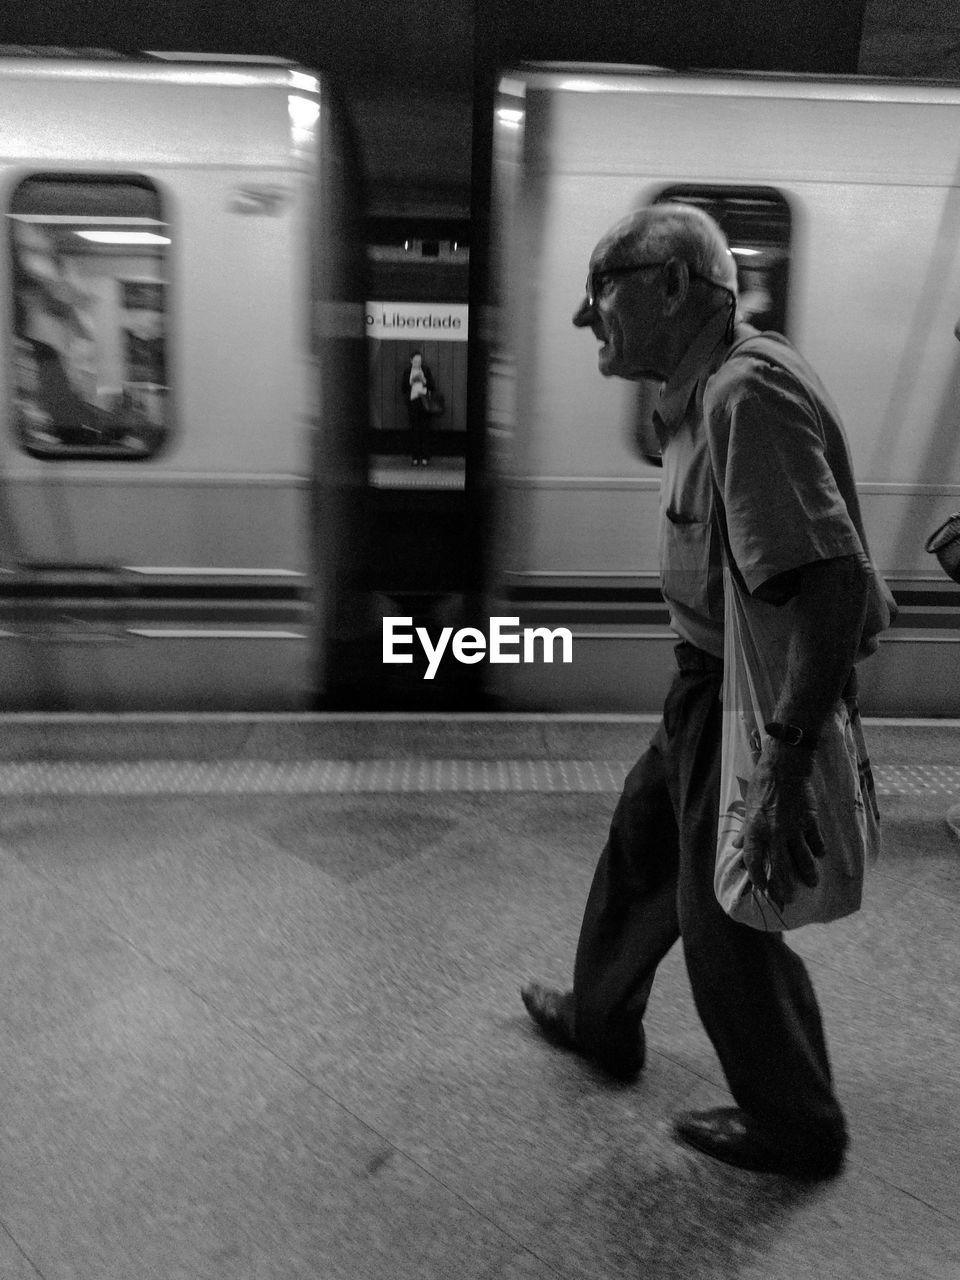 SIDE VIEW OF MAN AT RAILROAD STATION PLATFORM